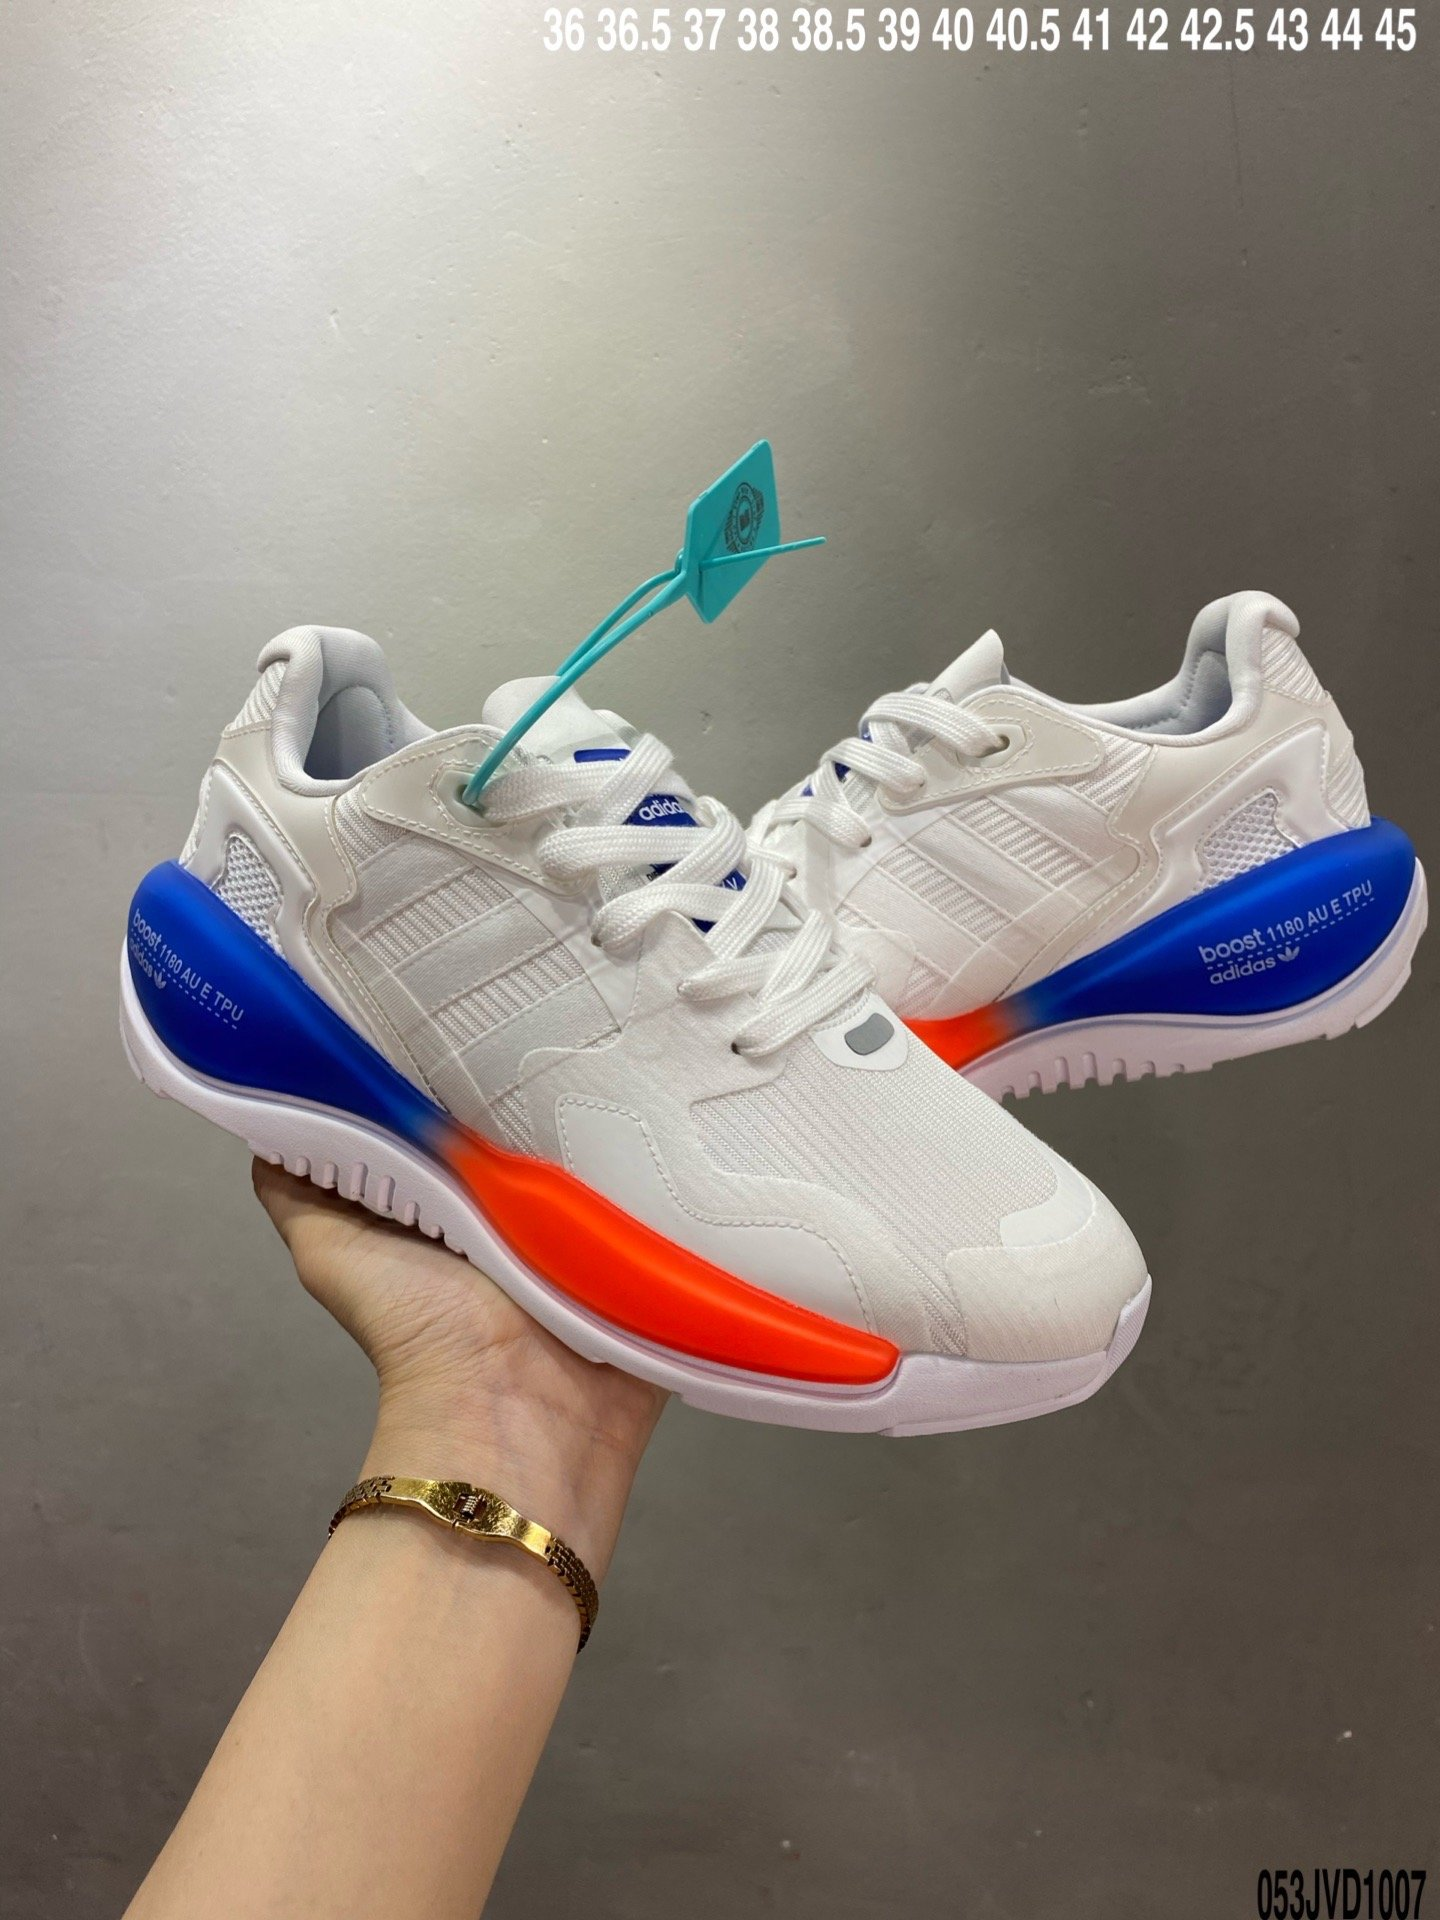 07081131805 - 运动跑鞋, 跑鞋, Originals ZX Alkyne Boost, Boost, Adidas